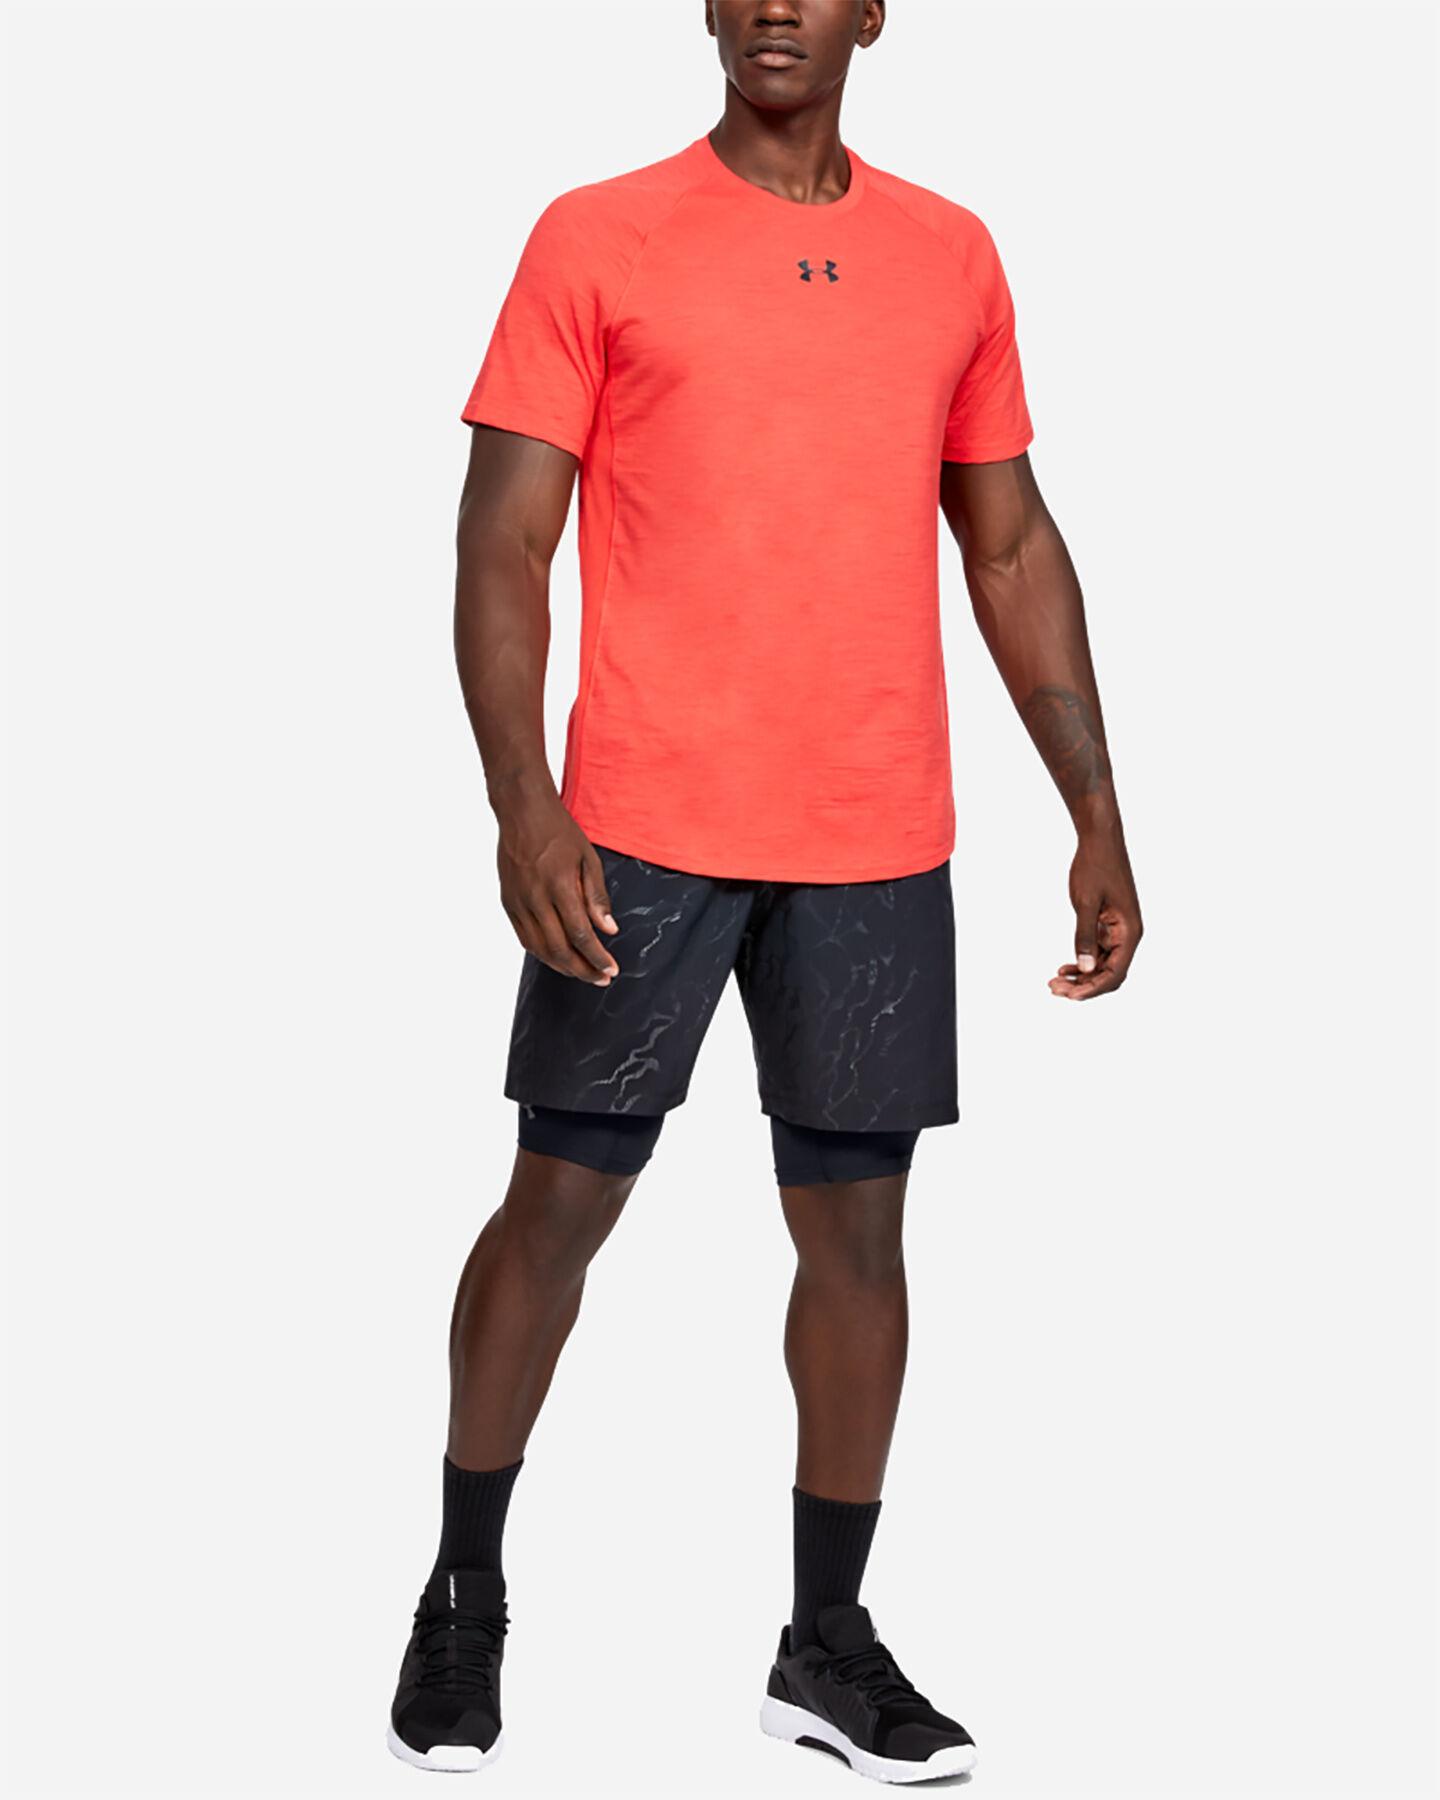 Pantalone training UNDER ARMOUR COMPRESSION XLNG M S5173434 scatto 5